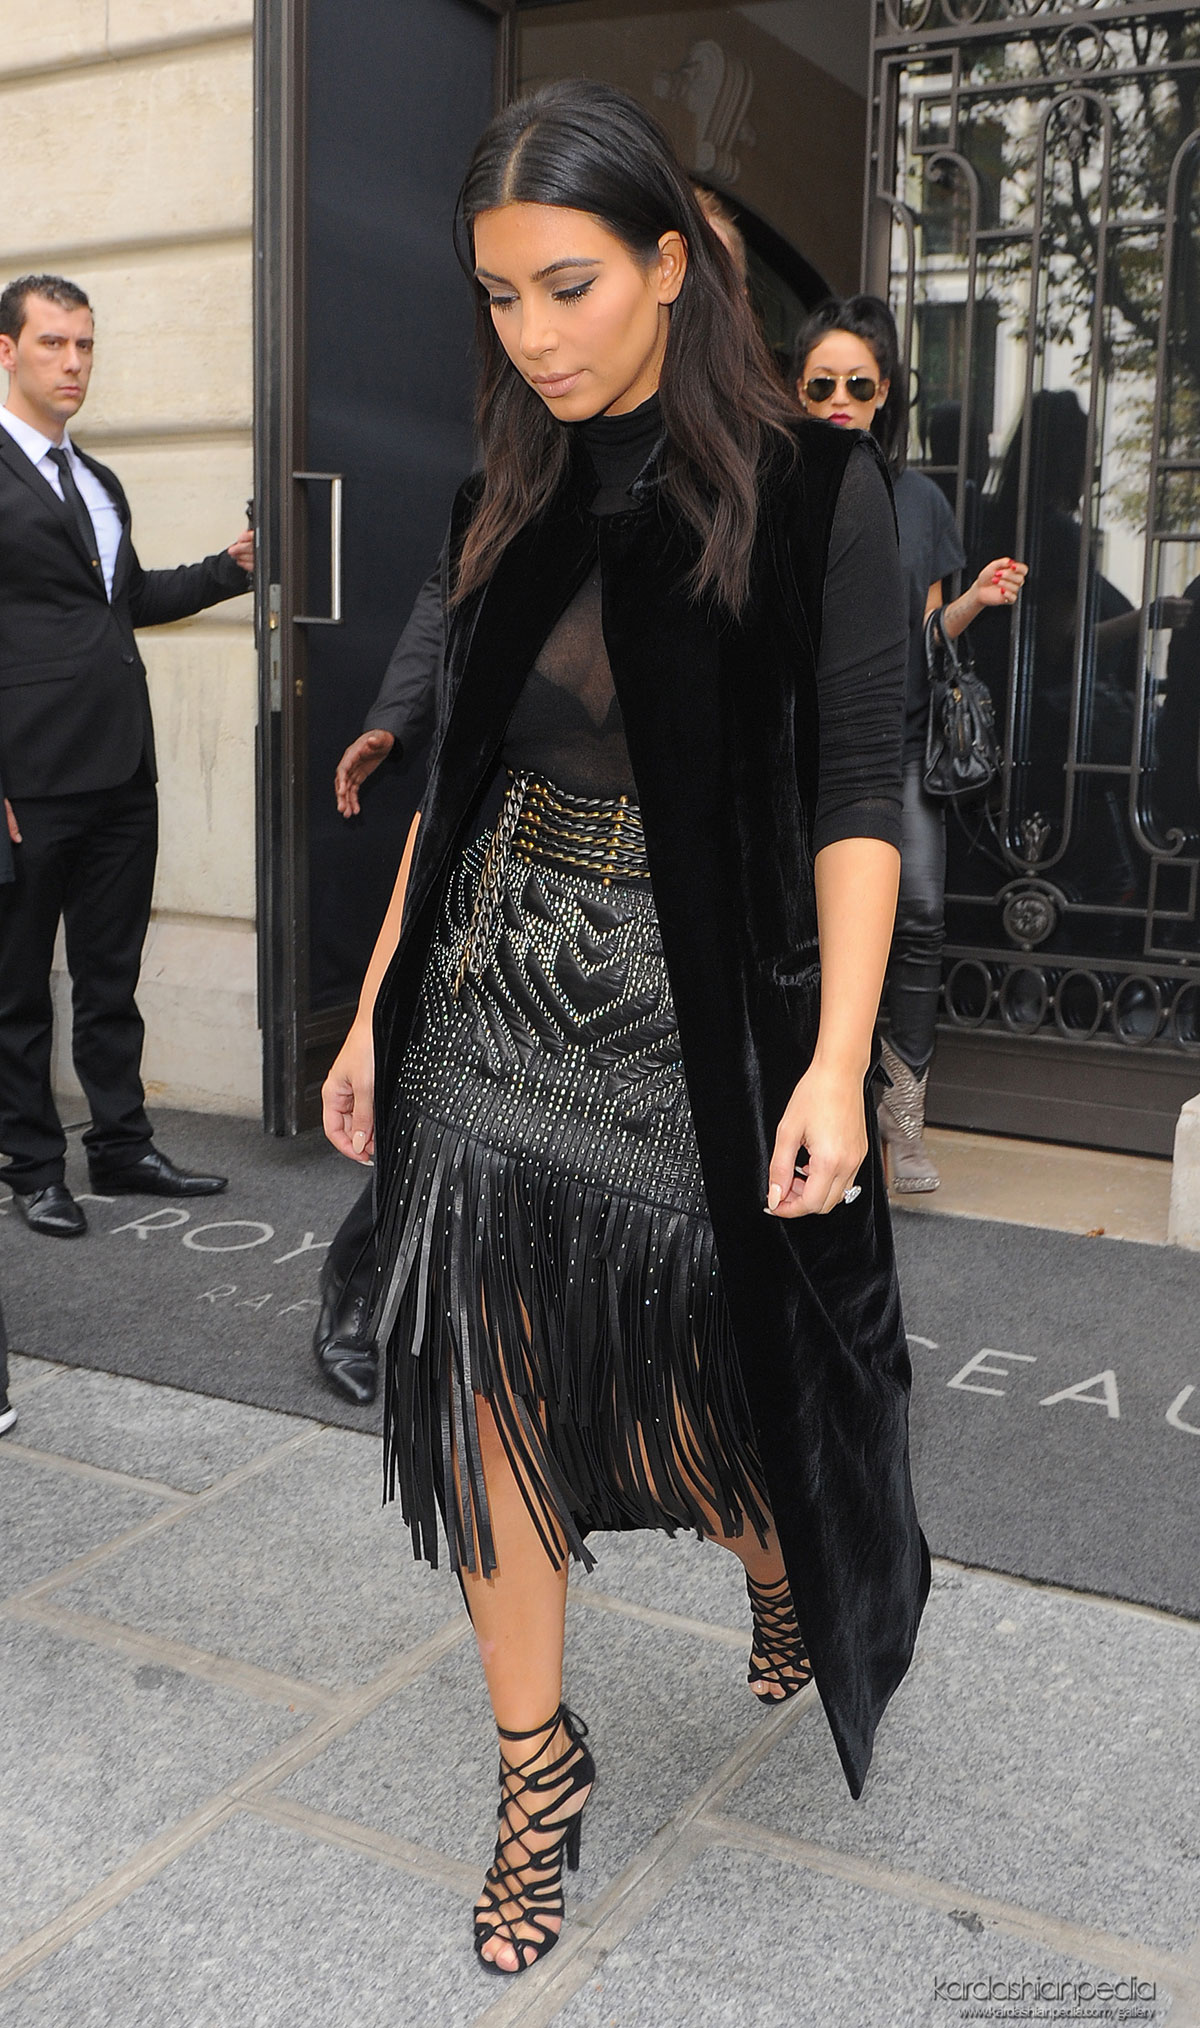 Kim Kardashian was seen shopping in Paris